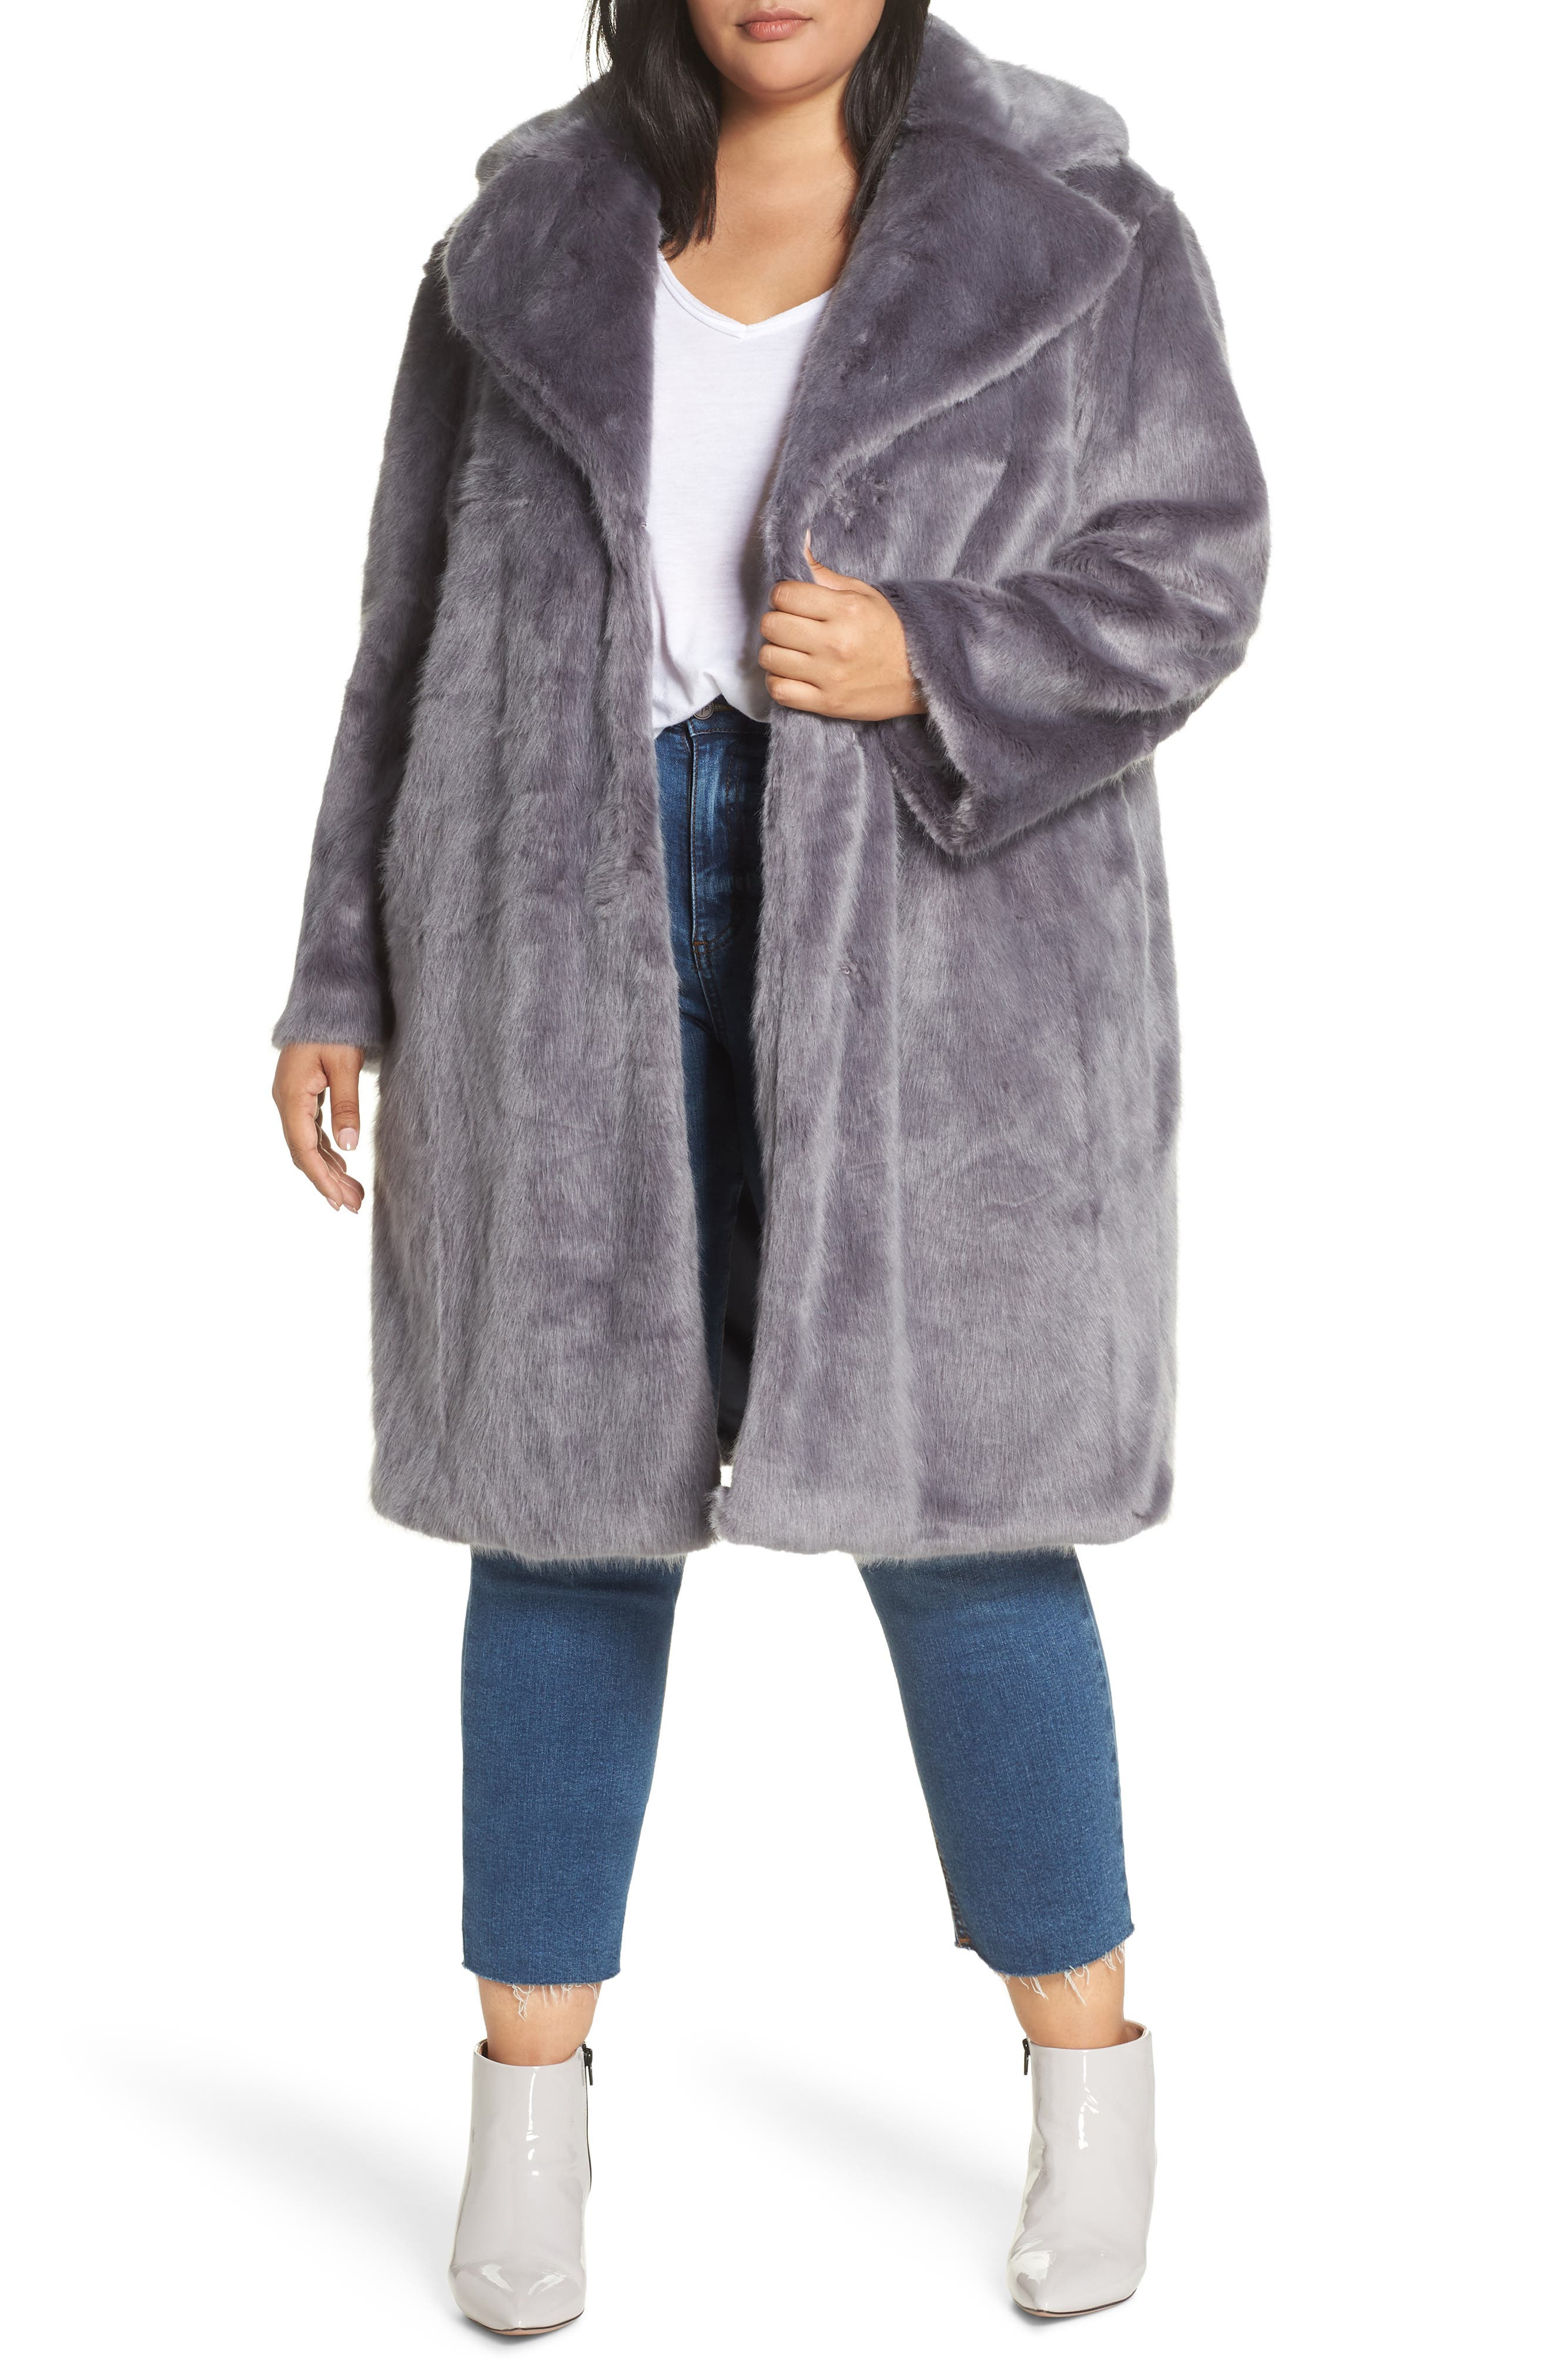 1a270eff61a4 Women s Teddy Coats   Jackets